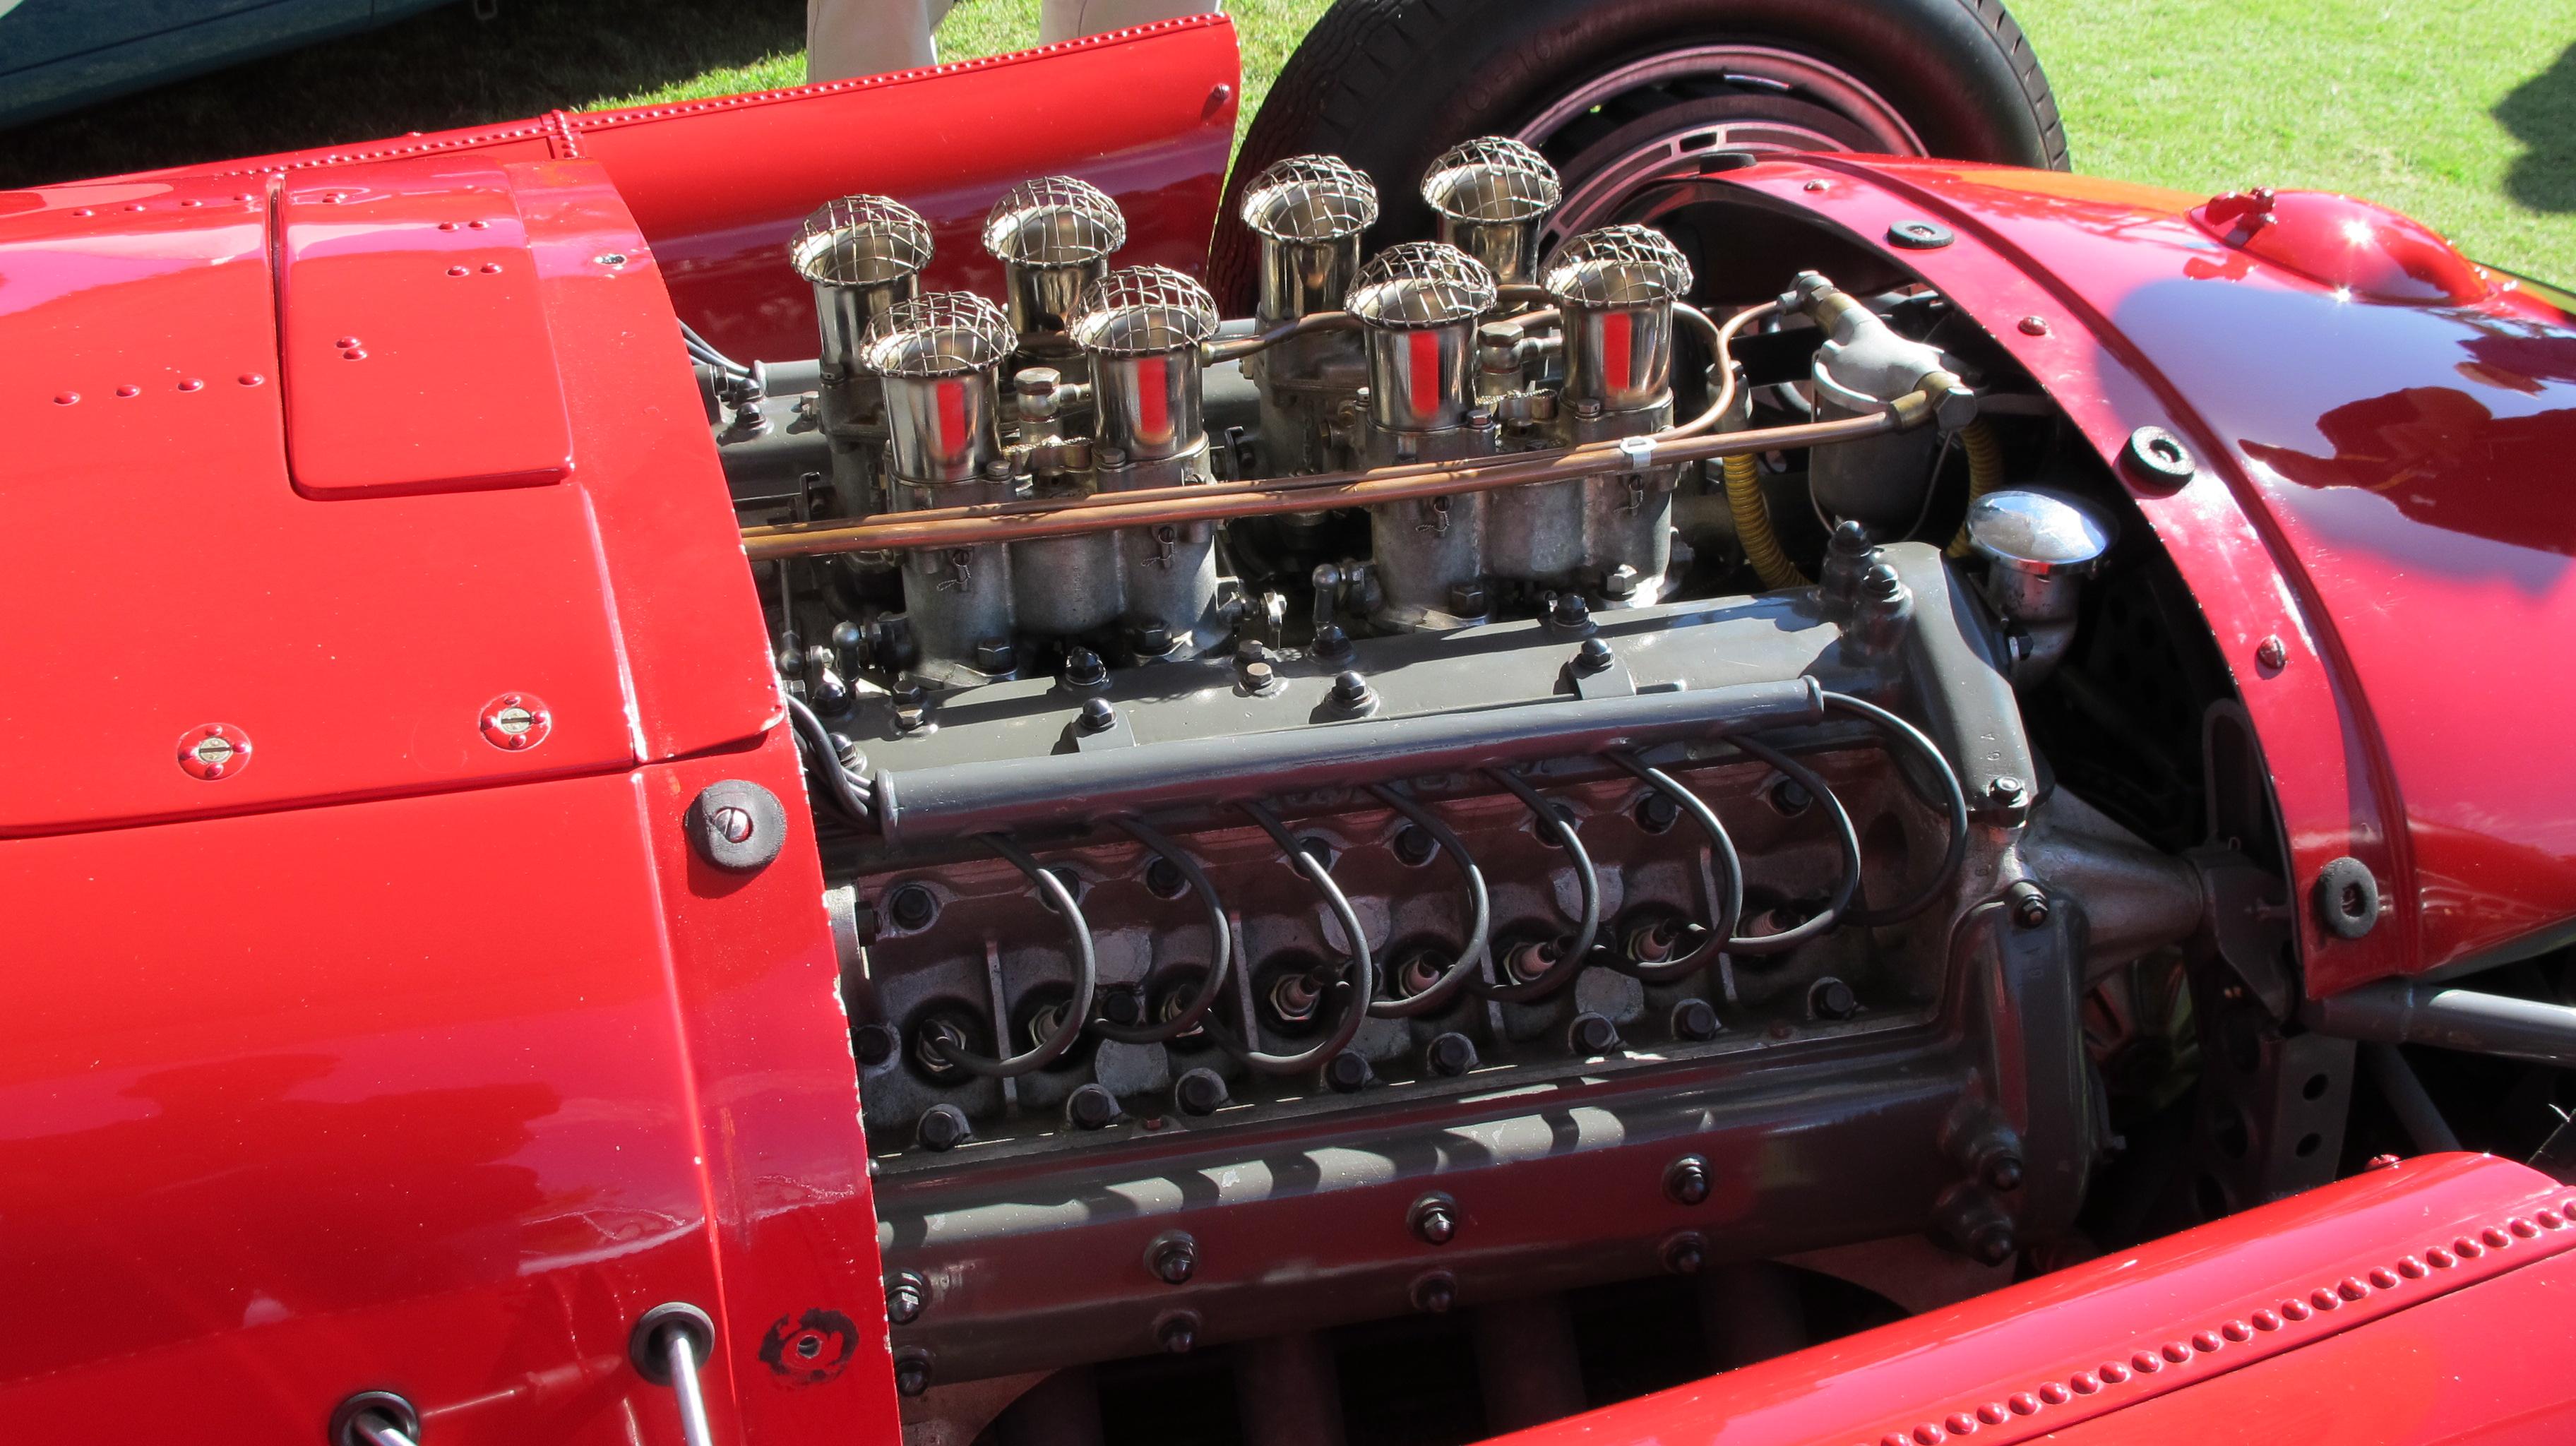 https://upload.wikimedia.org/wikipedia/commons/8/87/Lancia_-_Ferrari_D50_engine.JPG